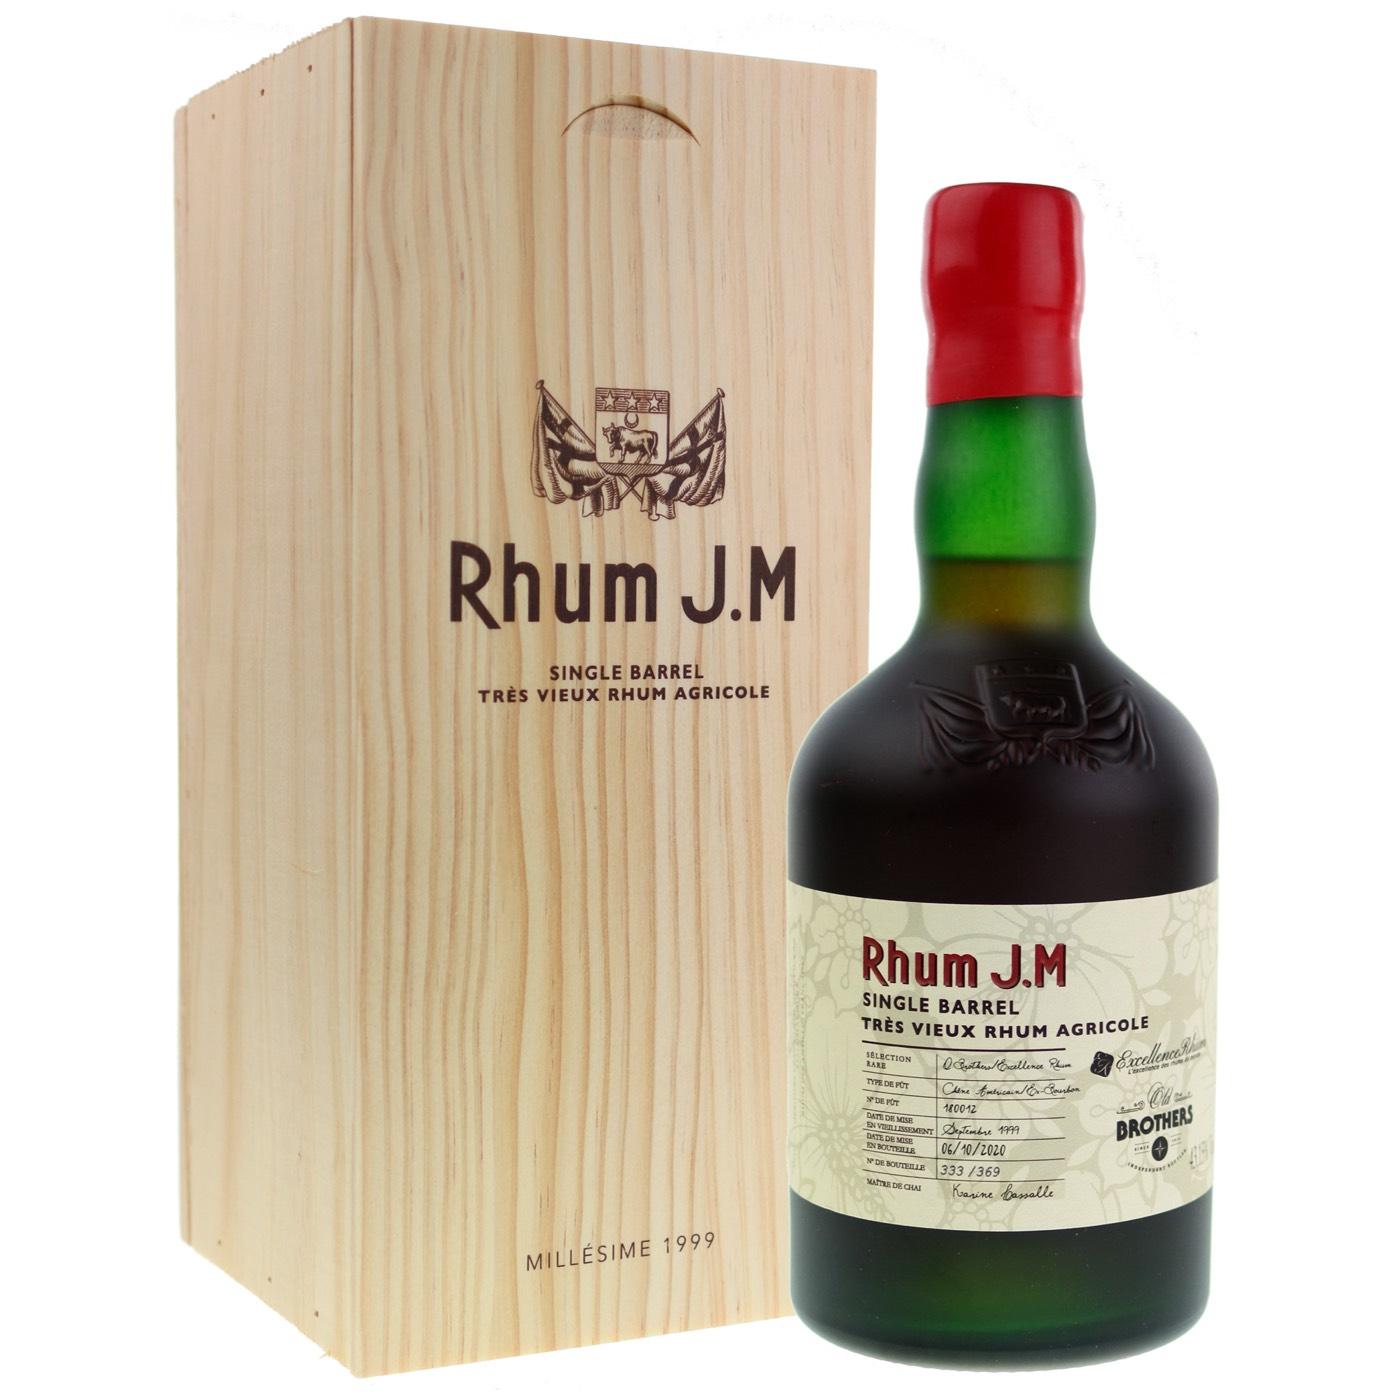 Bottle image of 21 years